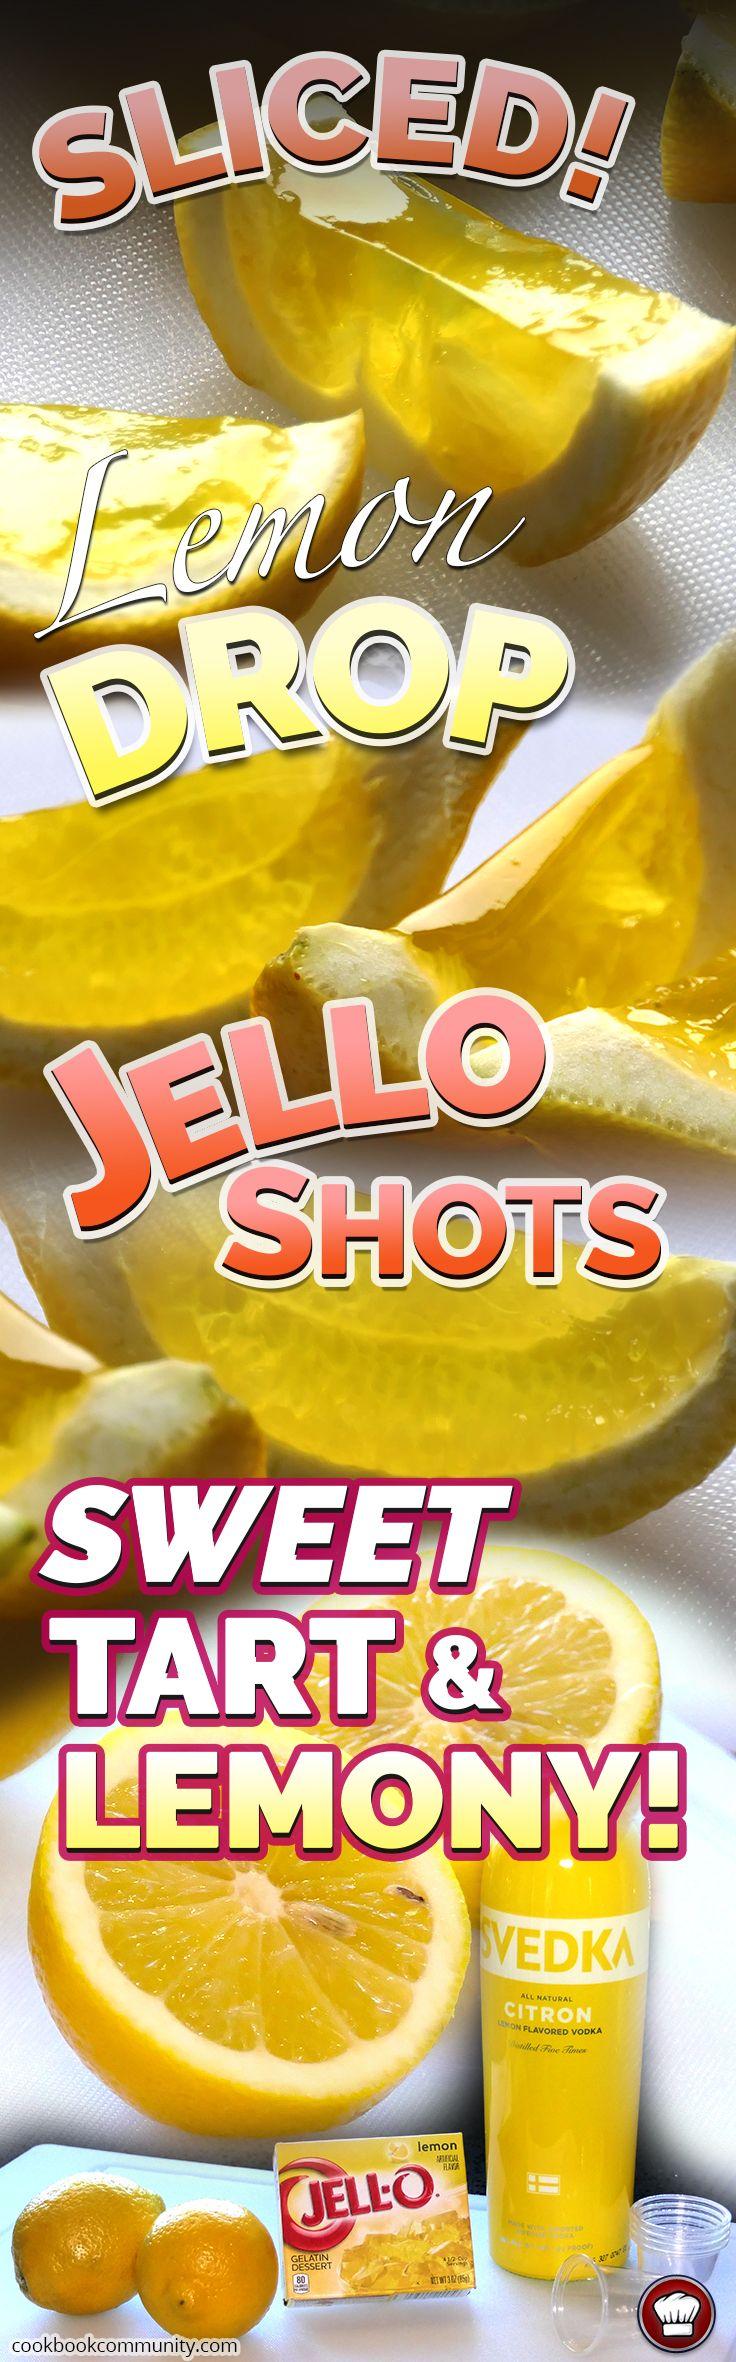 SLICED LEMON DROP JELLO SHOTS - The lemoniest jello shots you'll ever have!